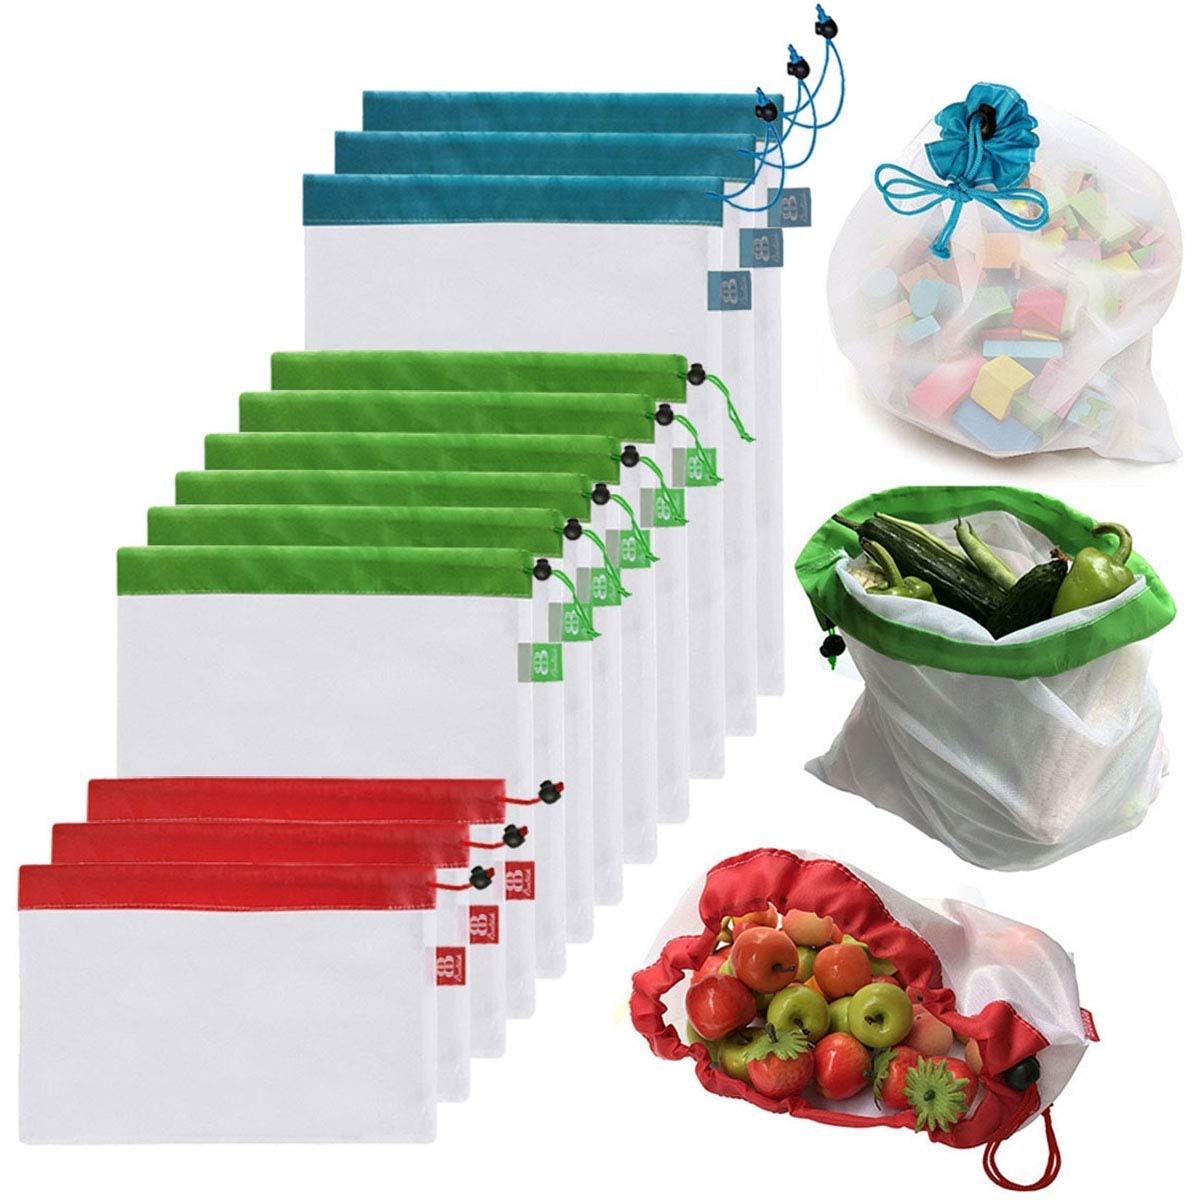 Brotrade Reusable Mesh Bags